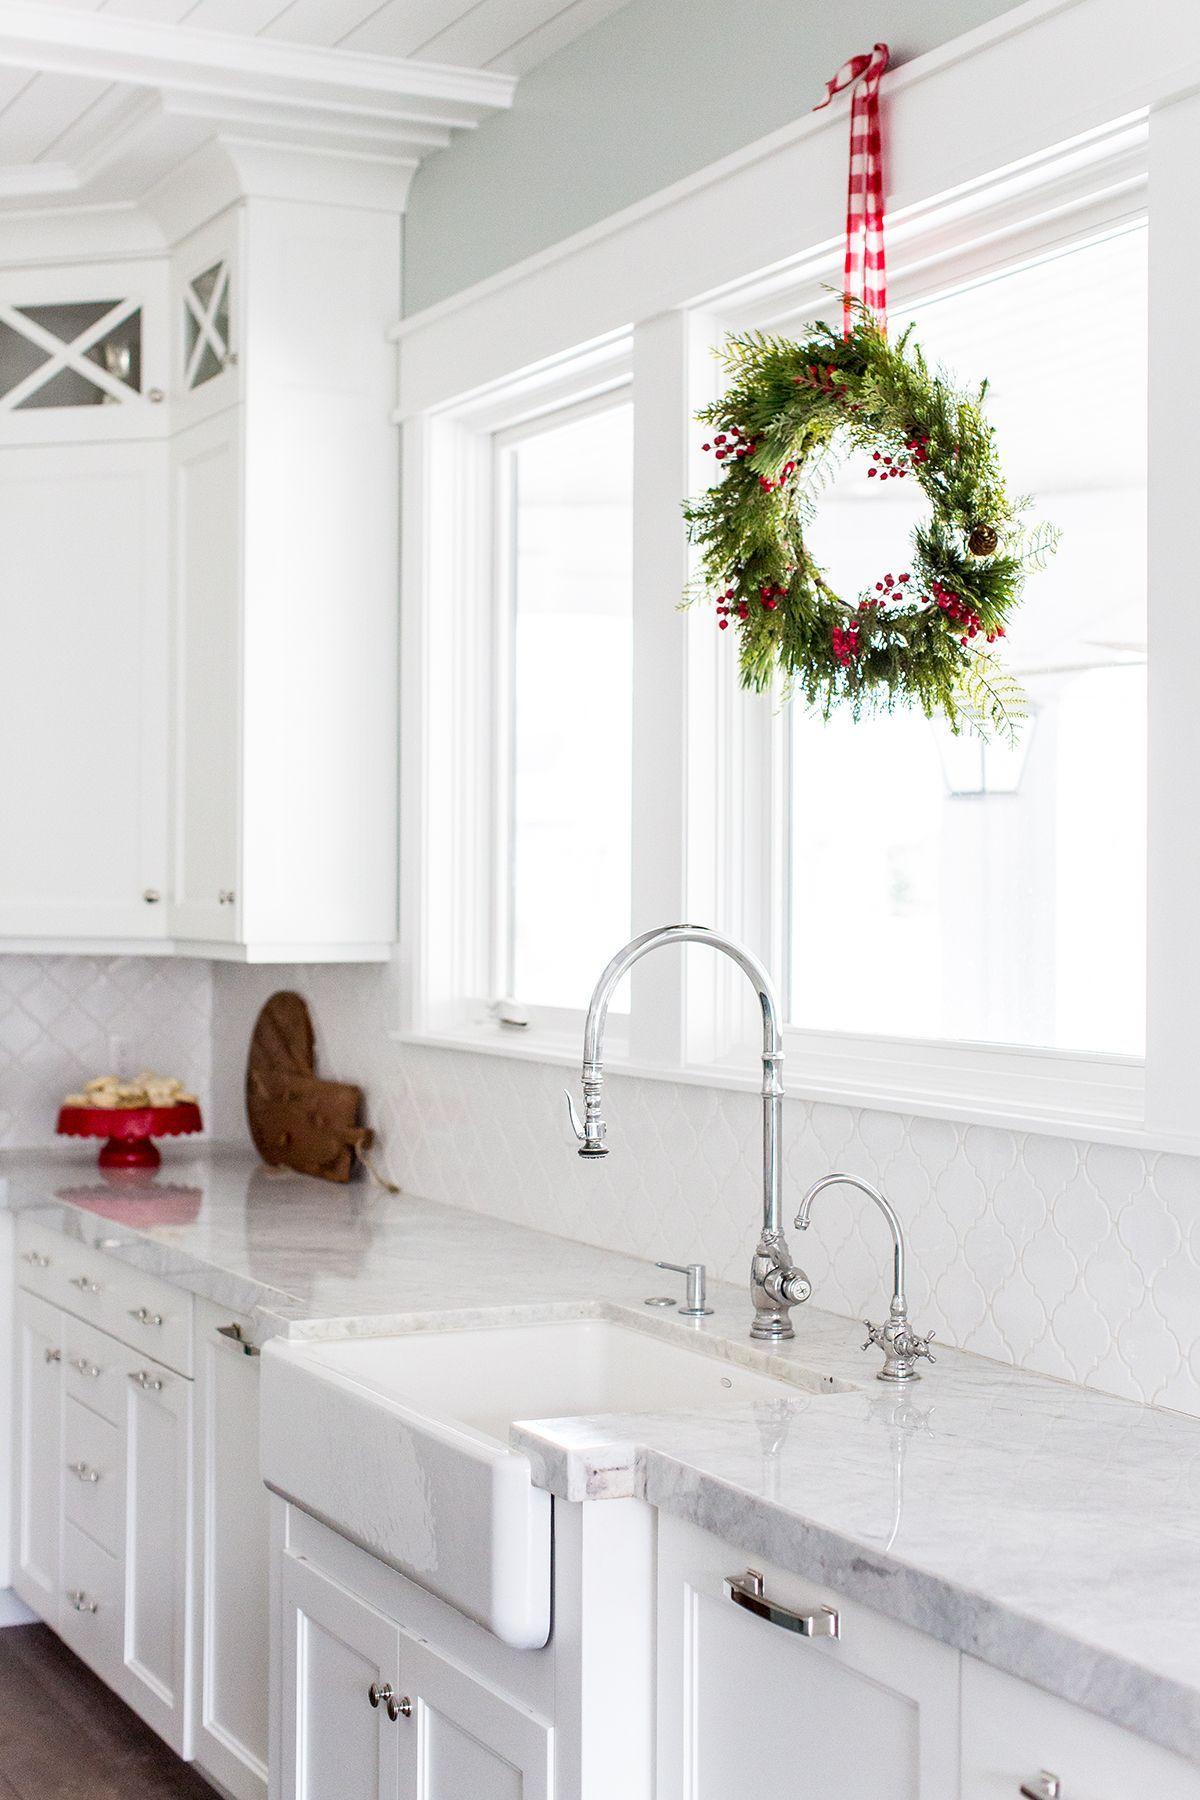 Ideas for kitchen decor  Kitchen Room Ideas  Mason Jar Kitchen Decor  Pinterest  Kitchen